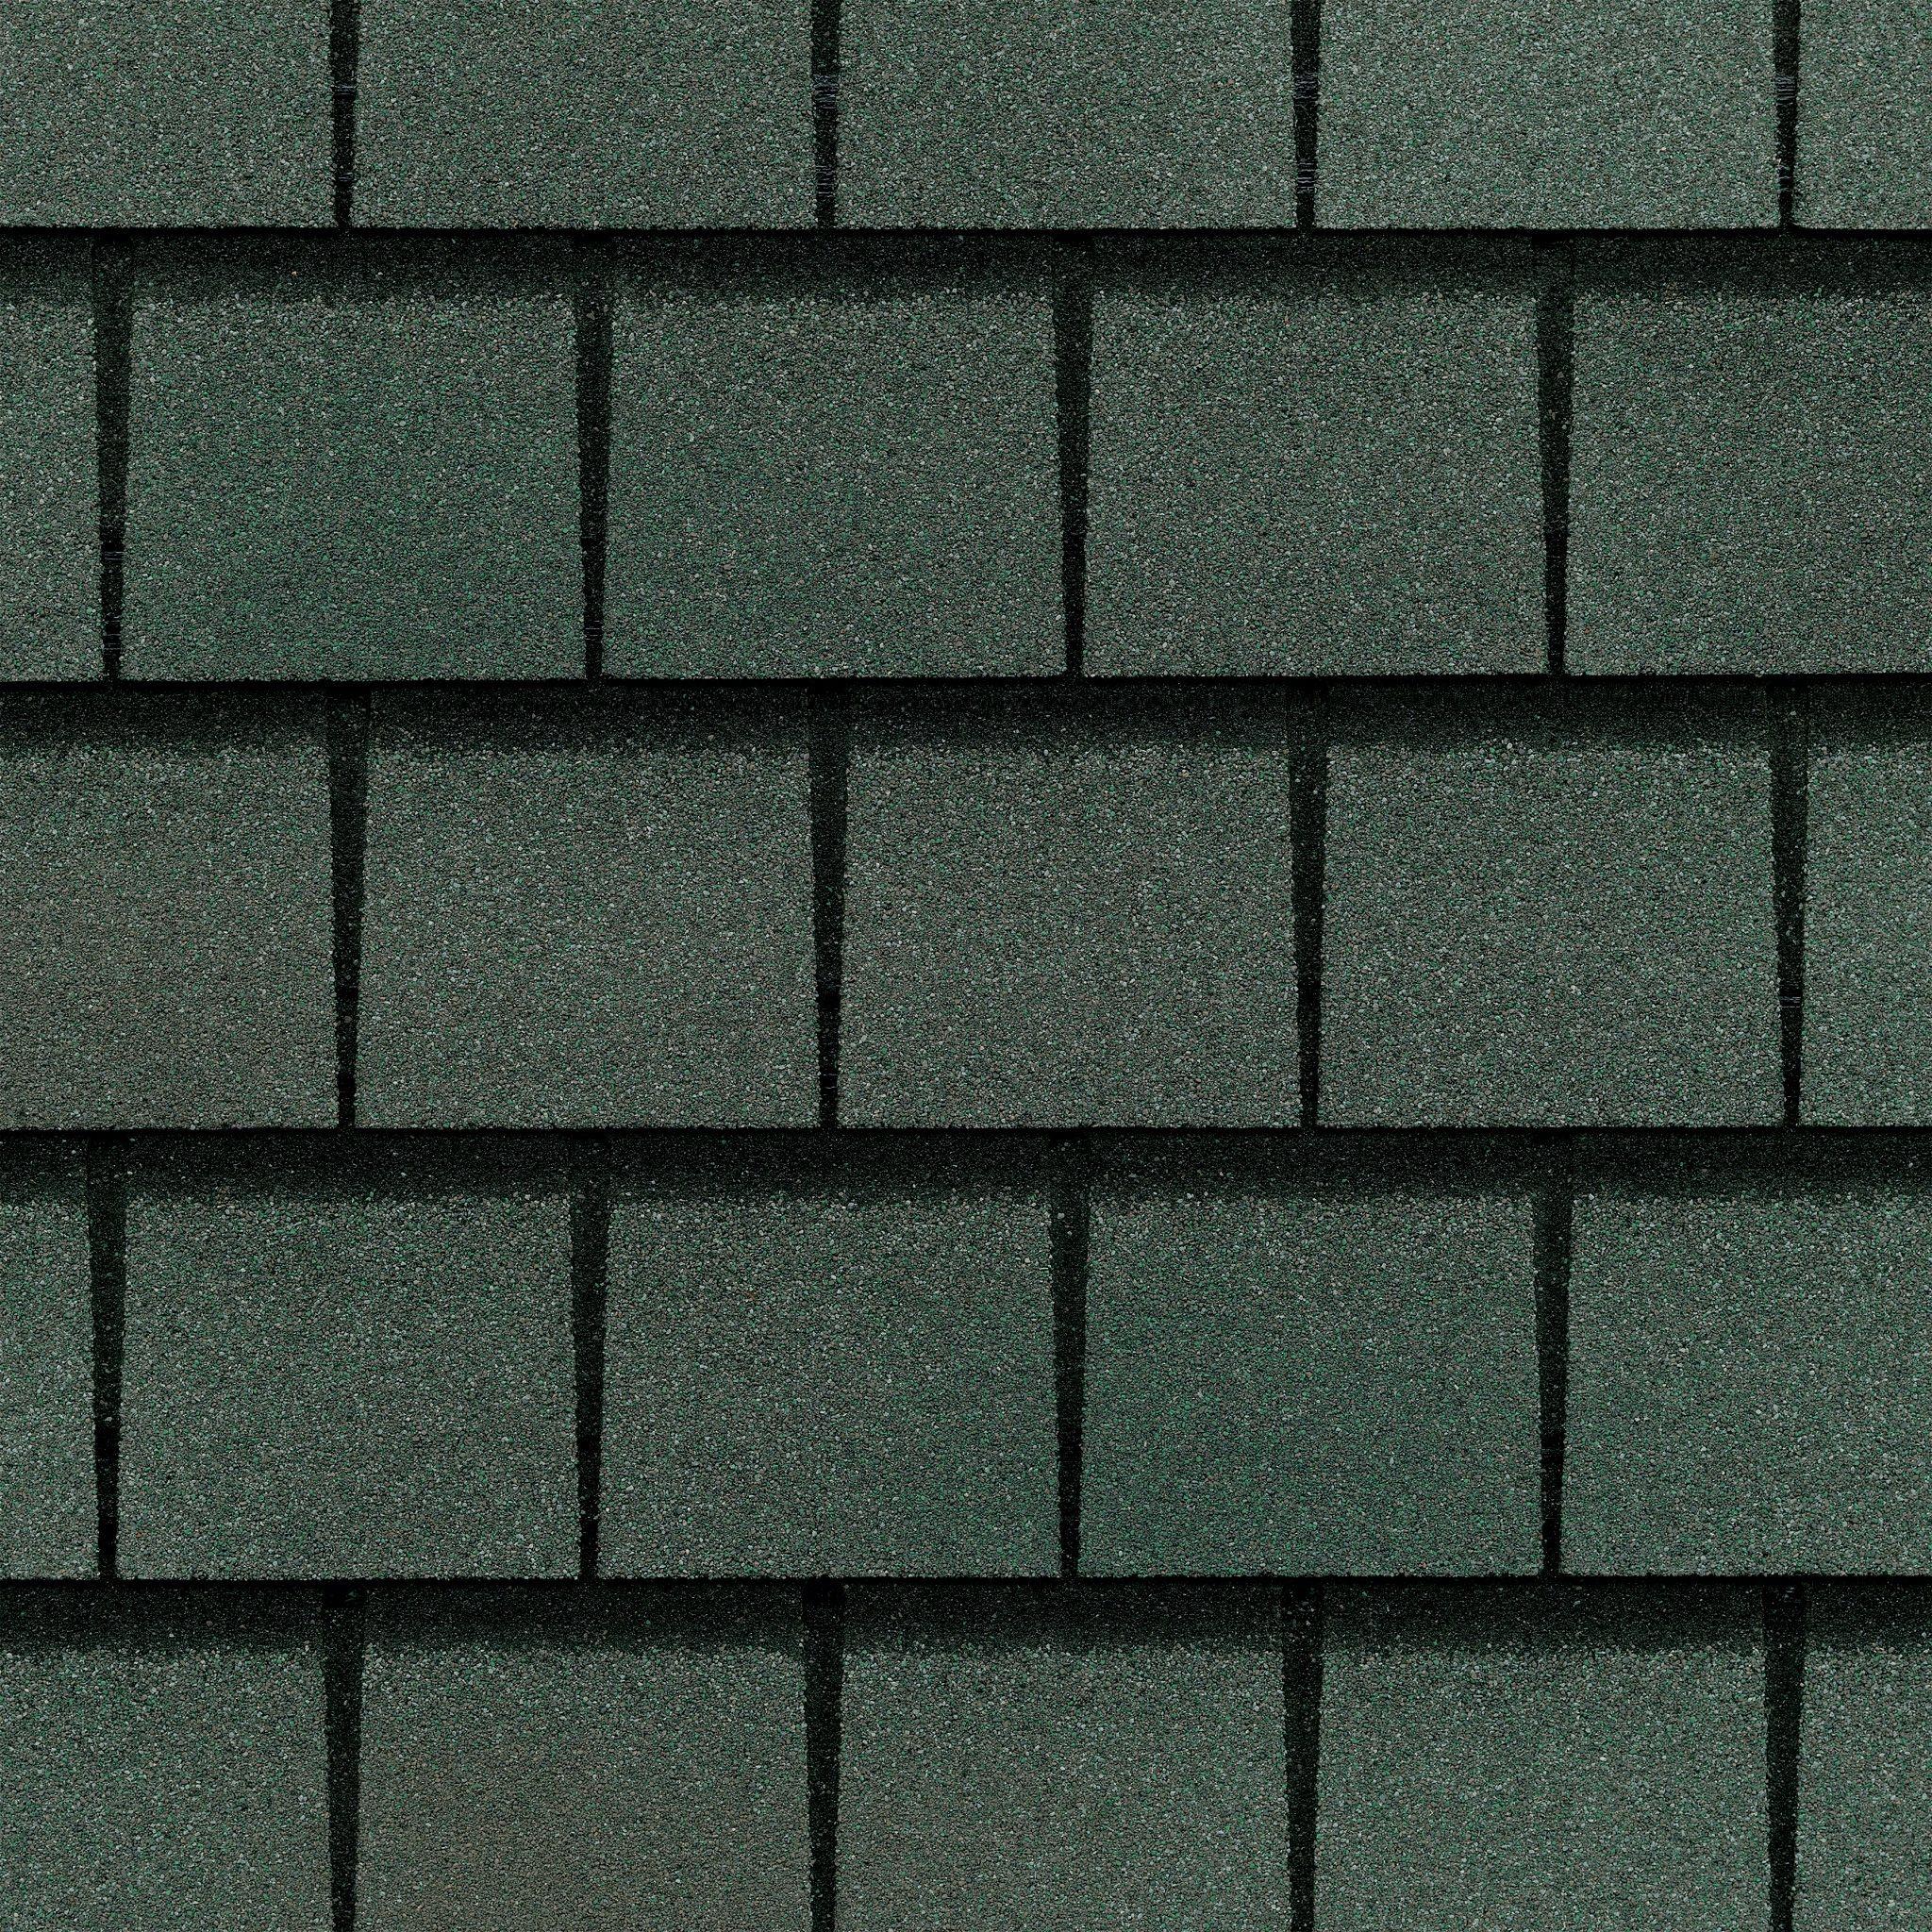 Best Slateline Roofing Shingles Architectural Shingles Roof 640 x 480